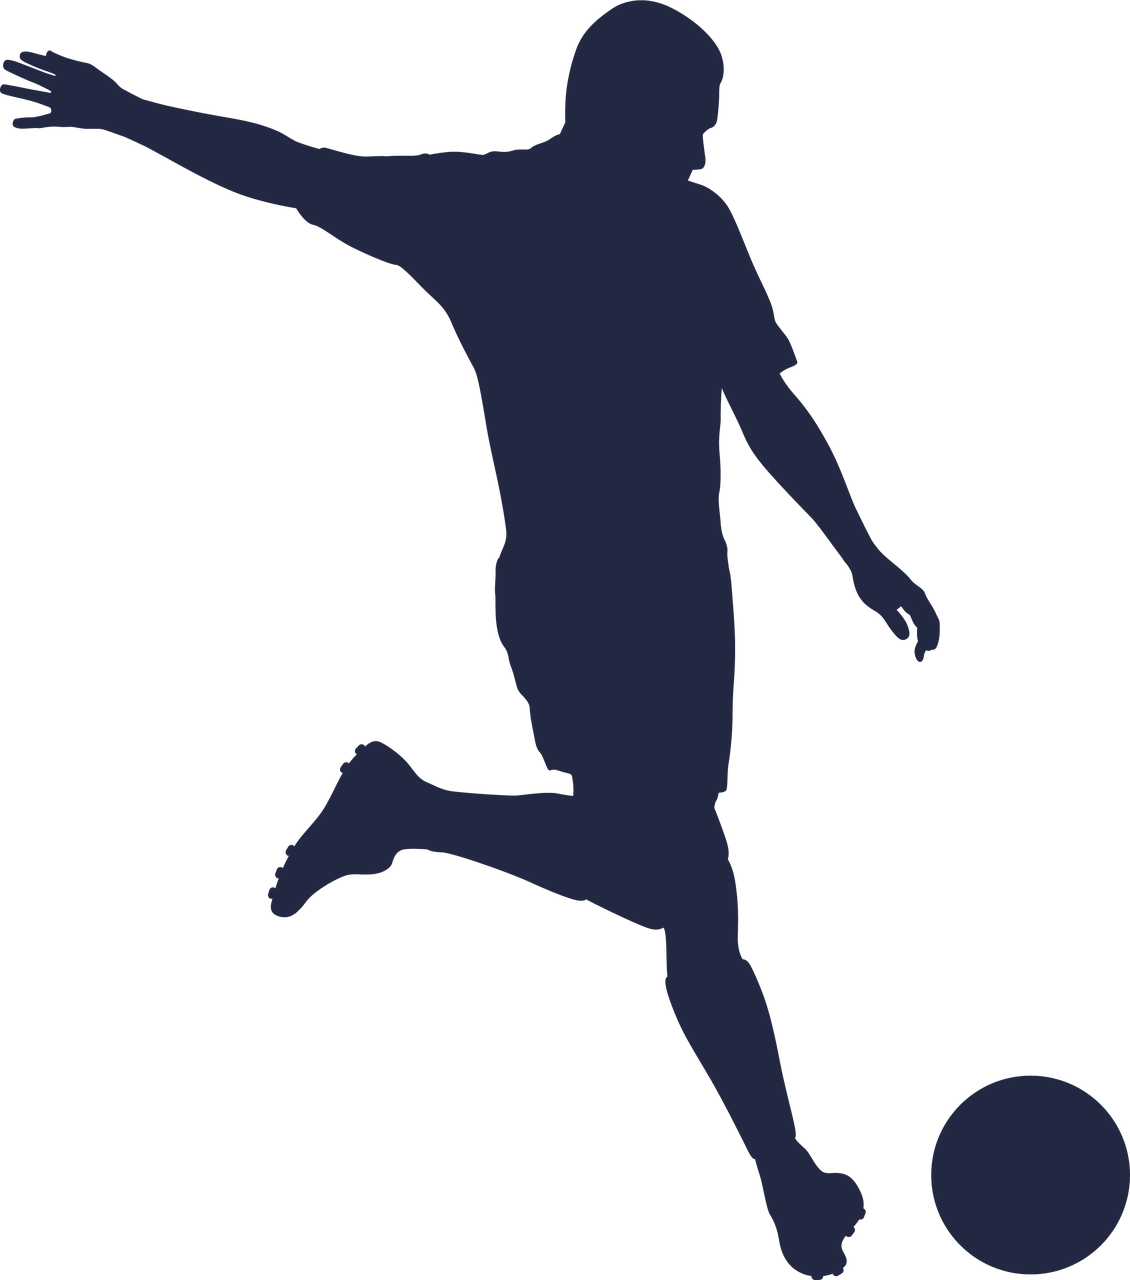 Soccer Silhouette #3 SVG Cut File